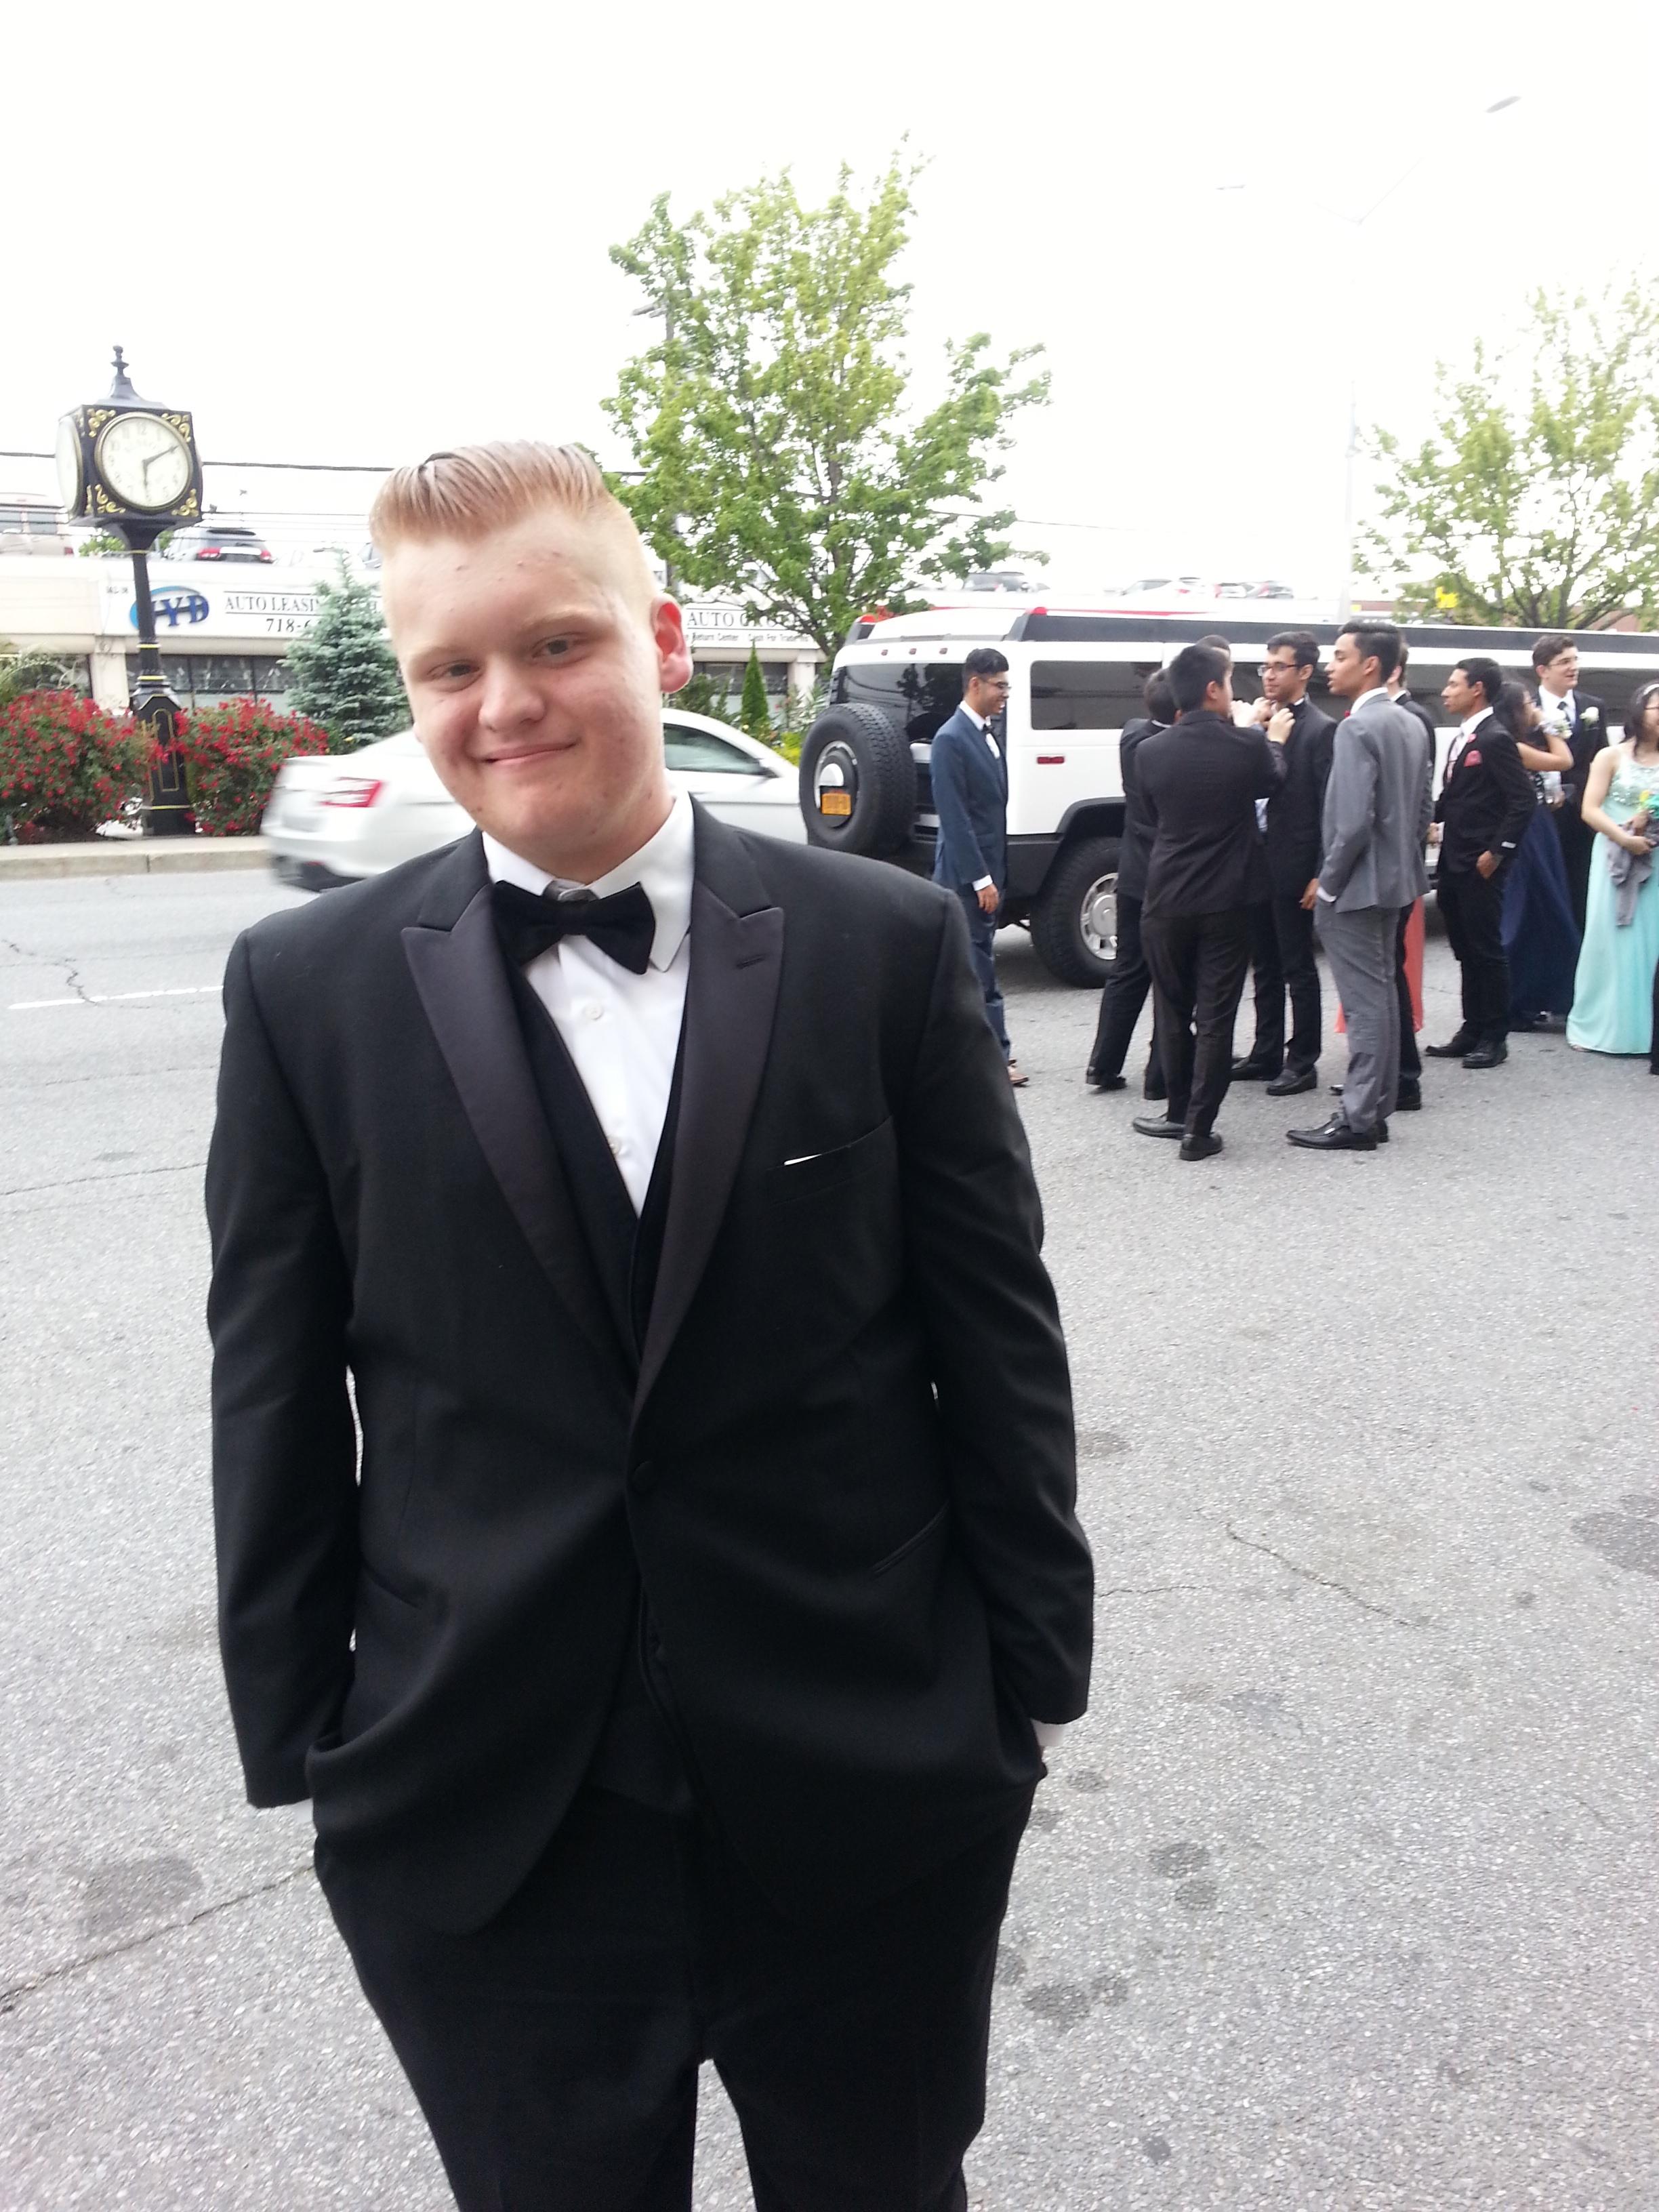 Jake senior prom pic